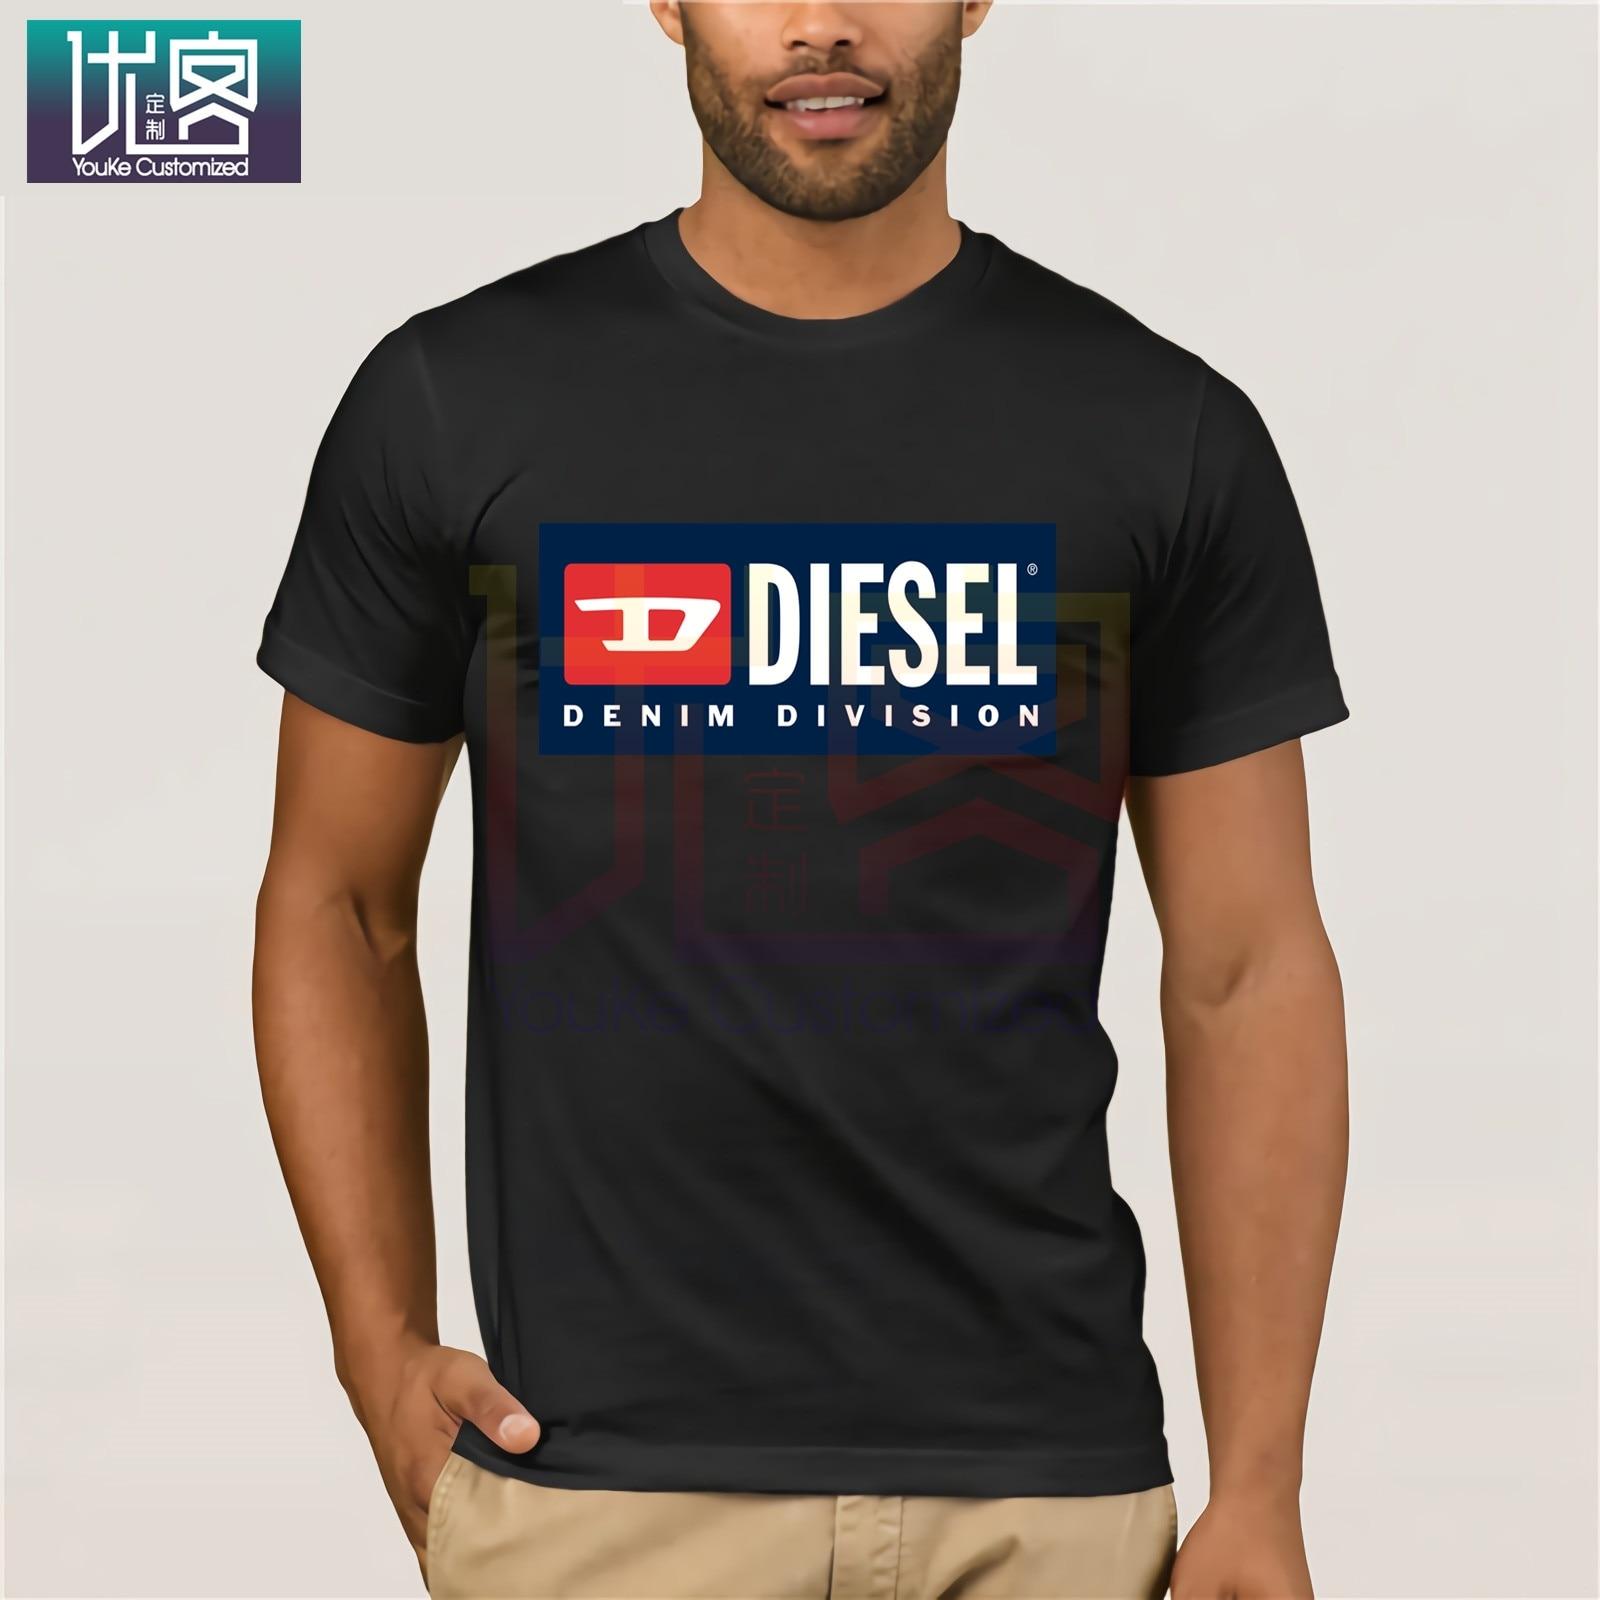 DIESEL New Fashion T-Shirt New Brand Shirt Printed T-Shirt Men's Slim Short Sleeve Shirt Custom Men's Fun Shirt For Men Tops